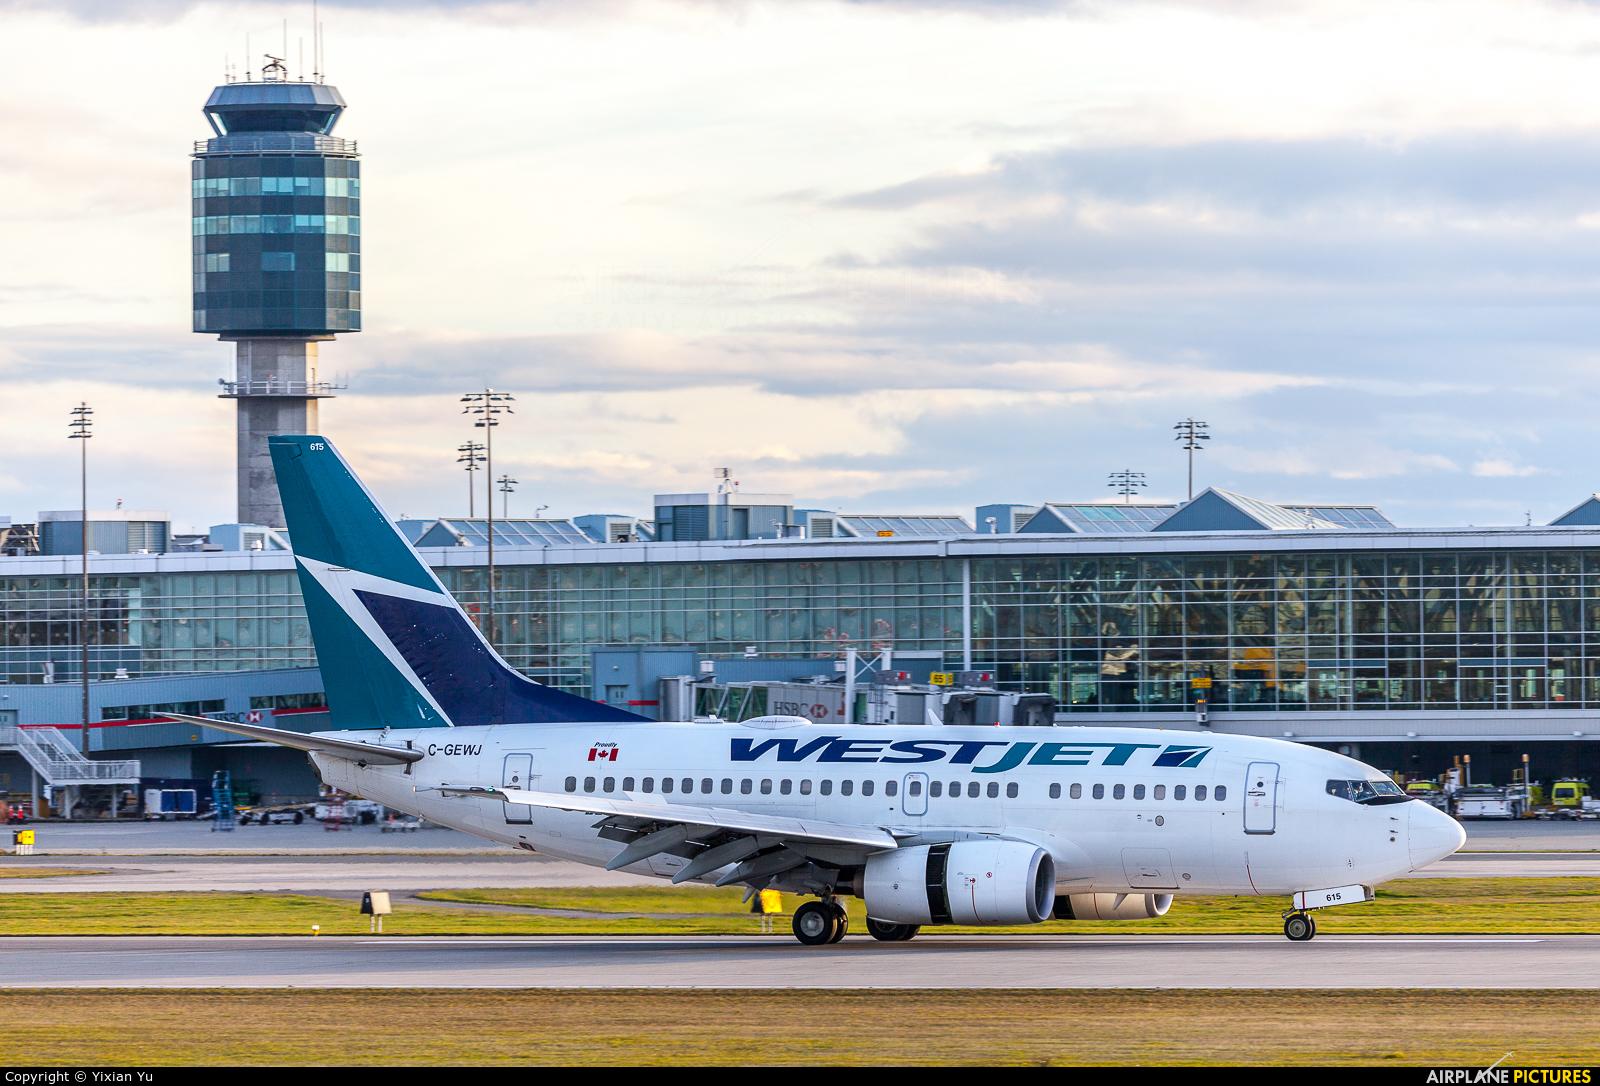 WestJet Airlines C-GEWJ aircraft at Vancouver Intl, BC